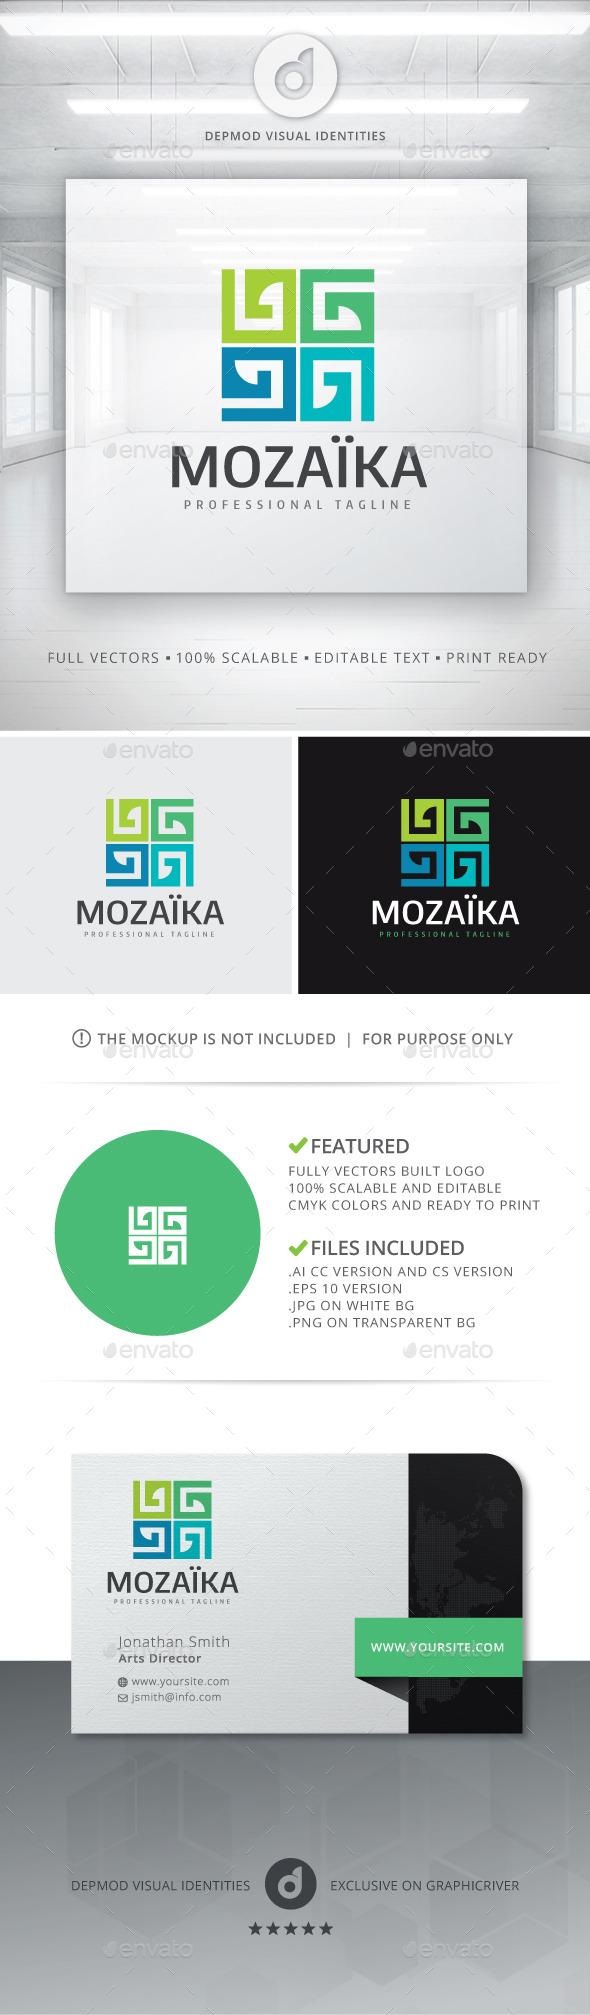 GraphicRiver Moza ka Logo 10992280